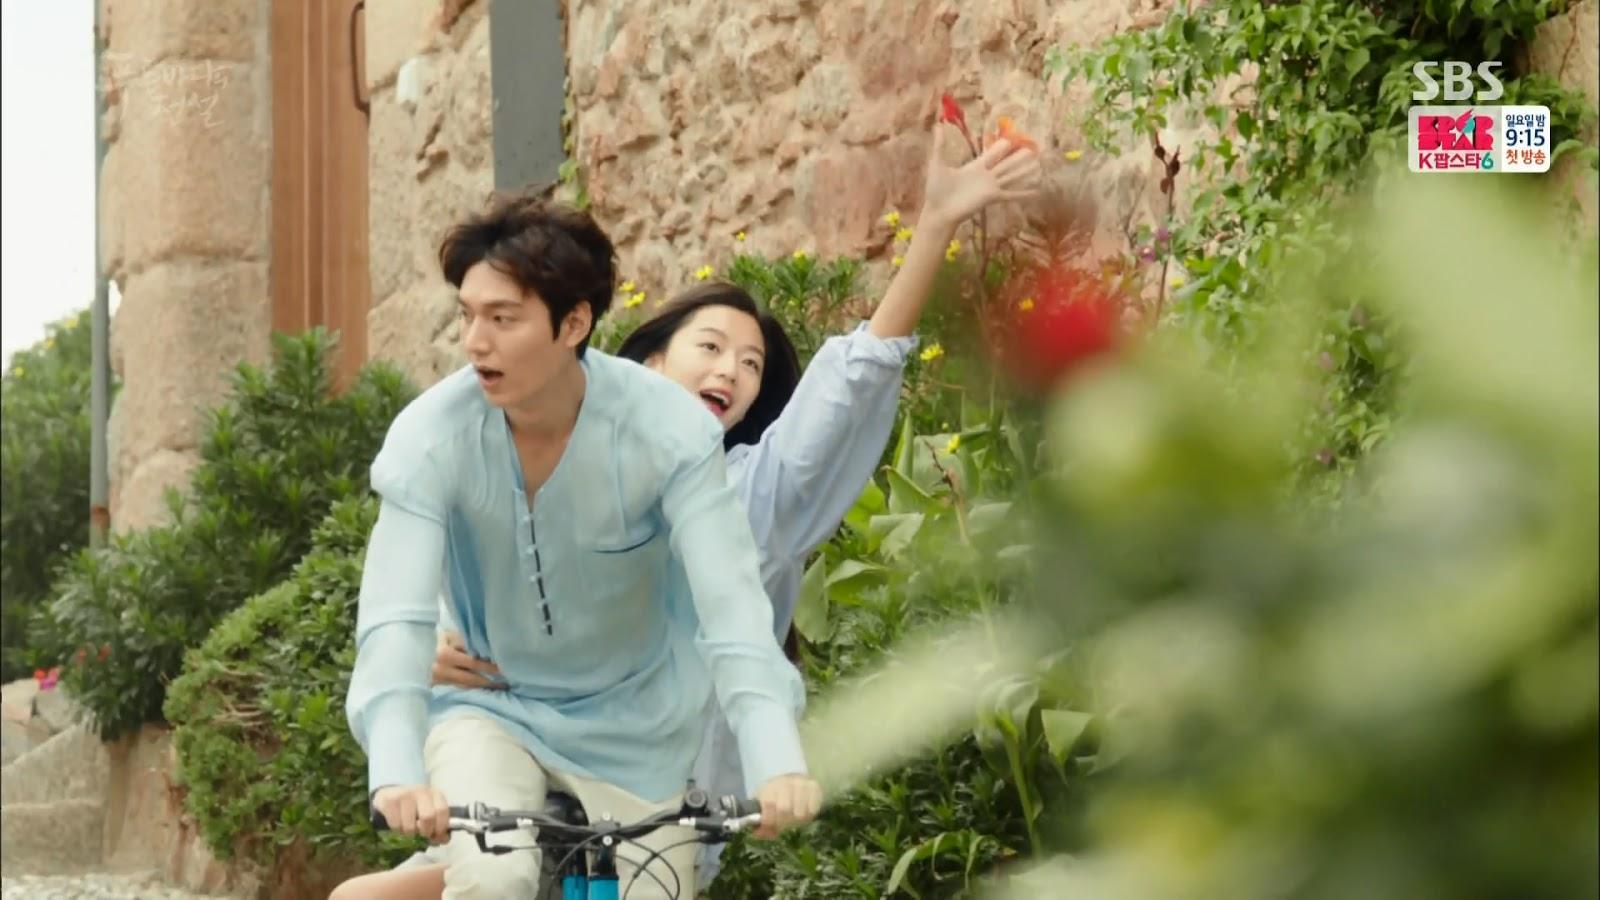 Screenshot Joon Jea And Cheong Yi Happy Moment The Legend Of The Blu Sea (2016)  1080p Episode 02 - www.uchiha-uzuma.com